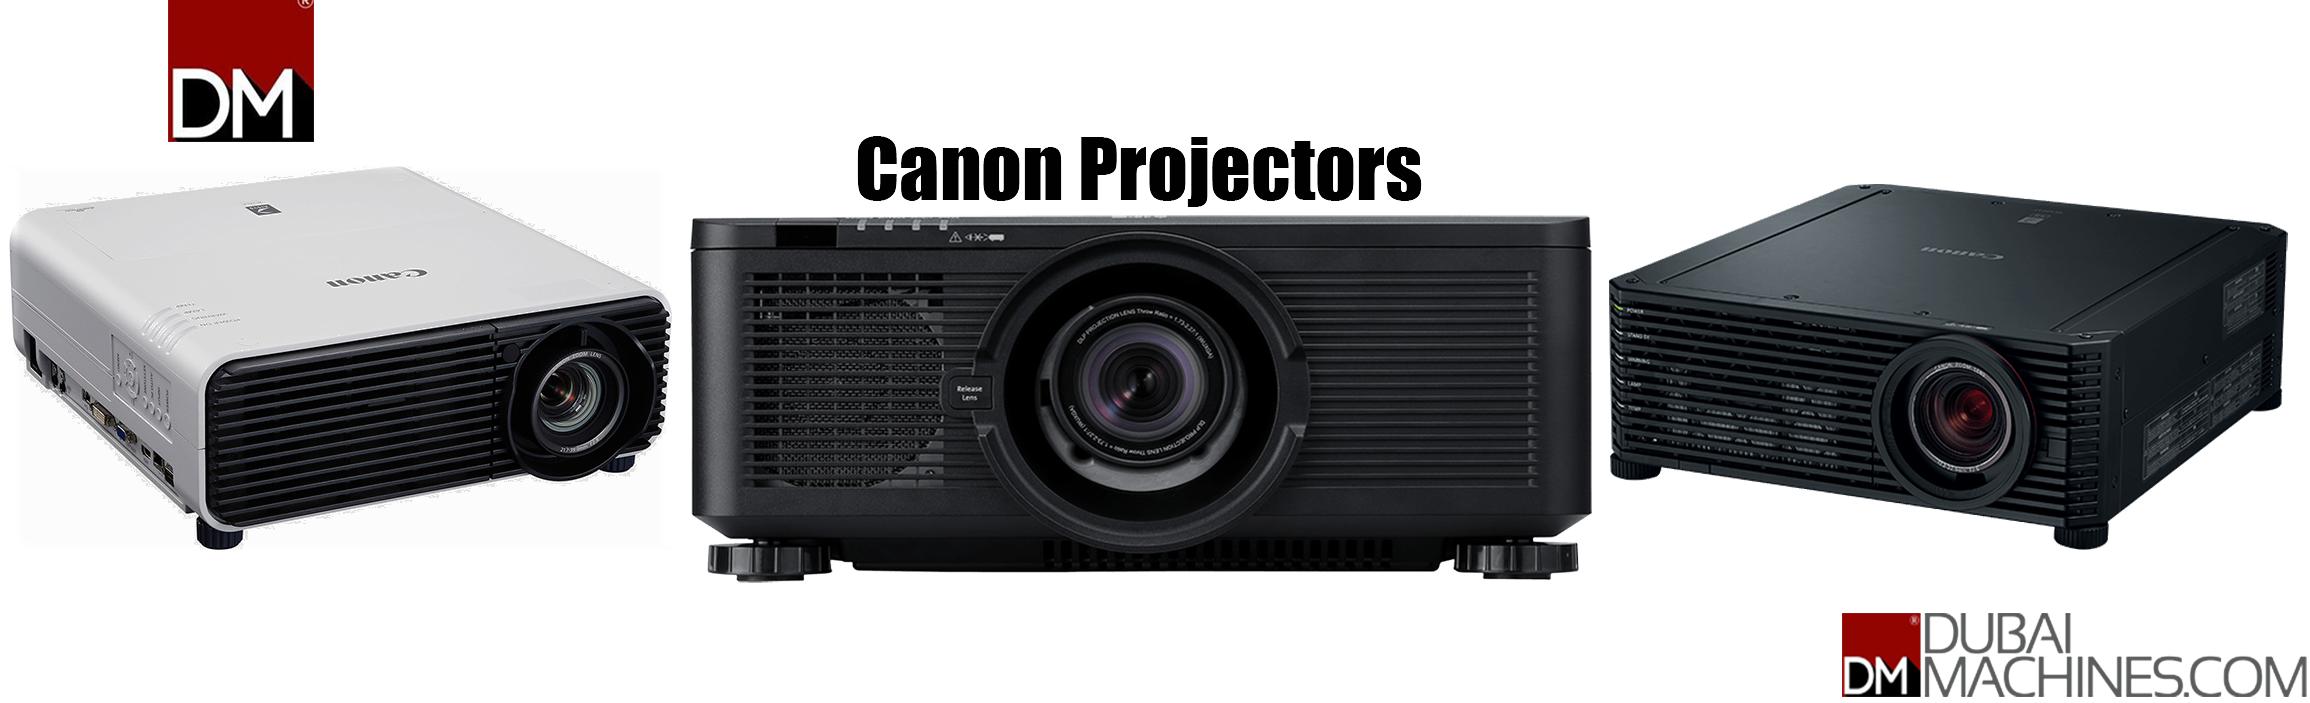 Canon projectors landing page